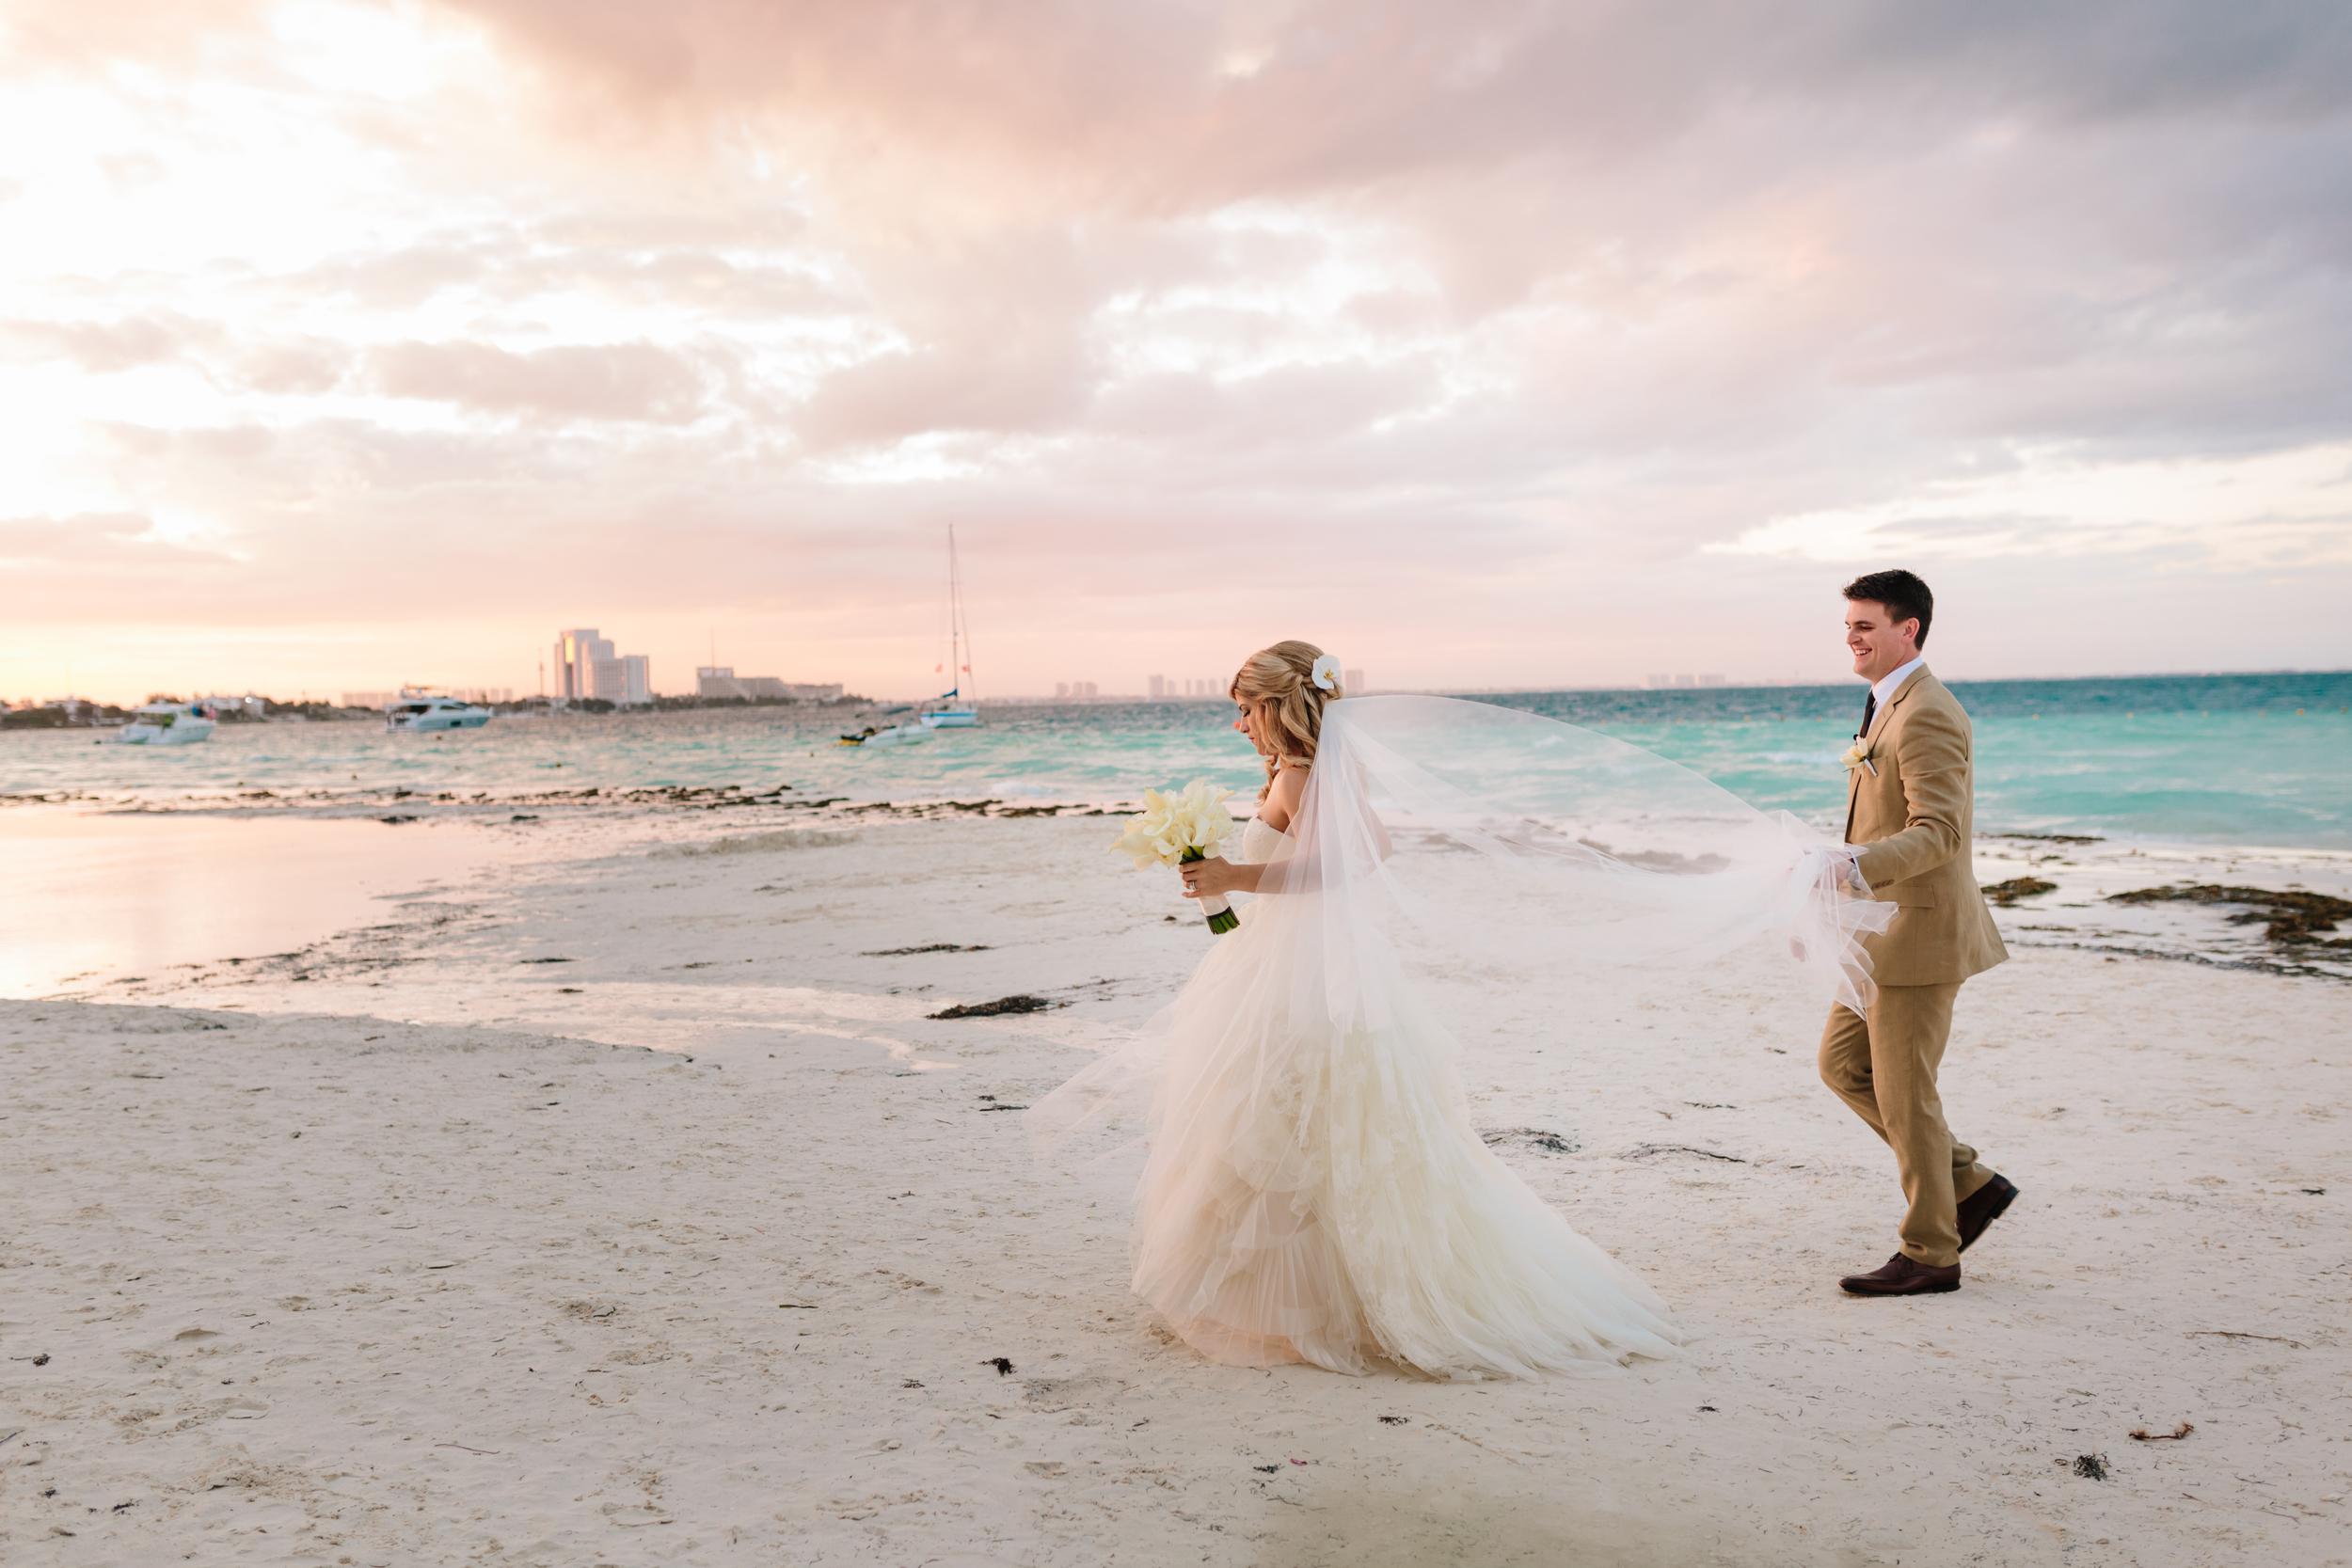 Cancun Mexico, Destination Wedding Photographer, Dream Sands Cancun, Hurtienne Photography  (74)